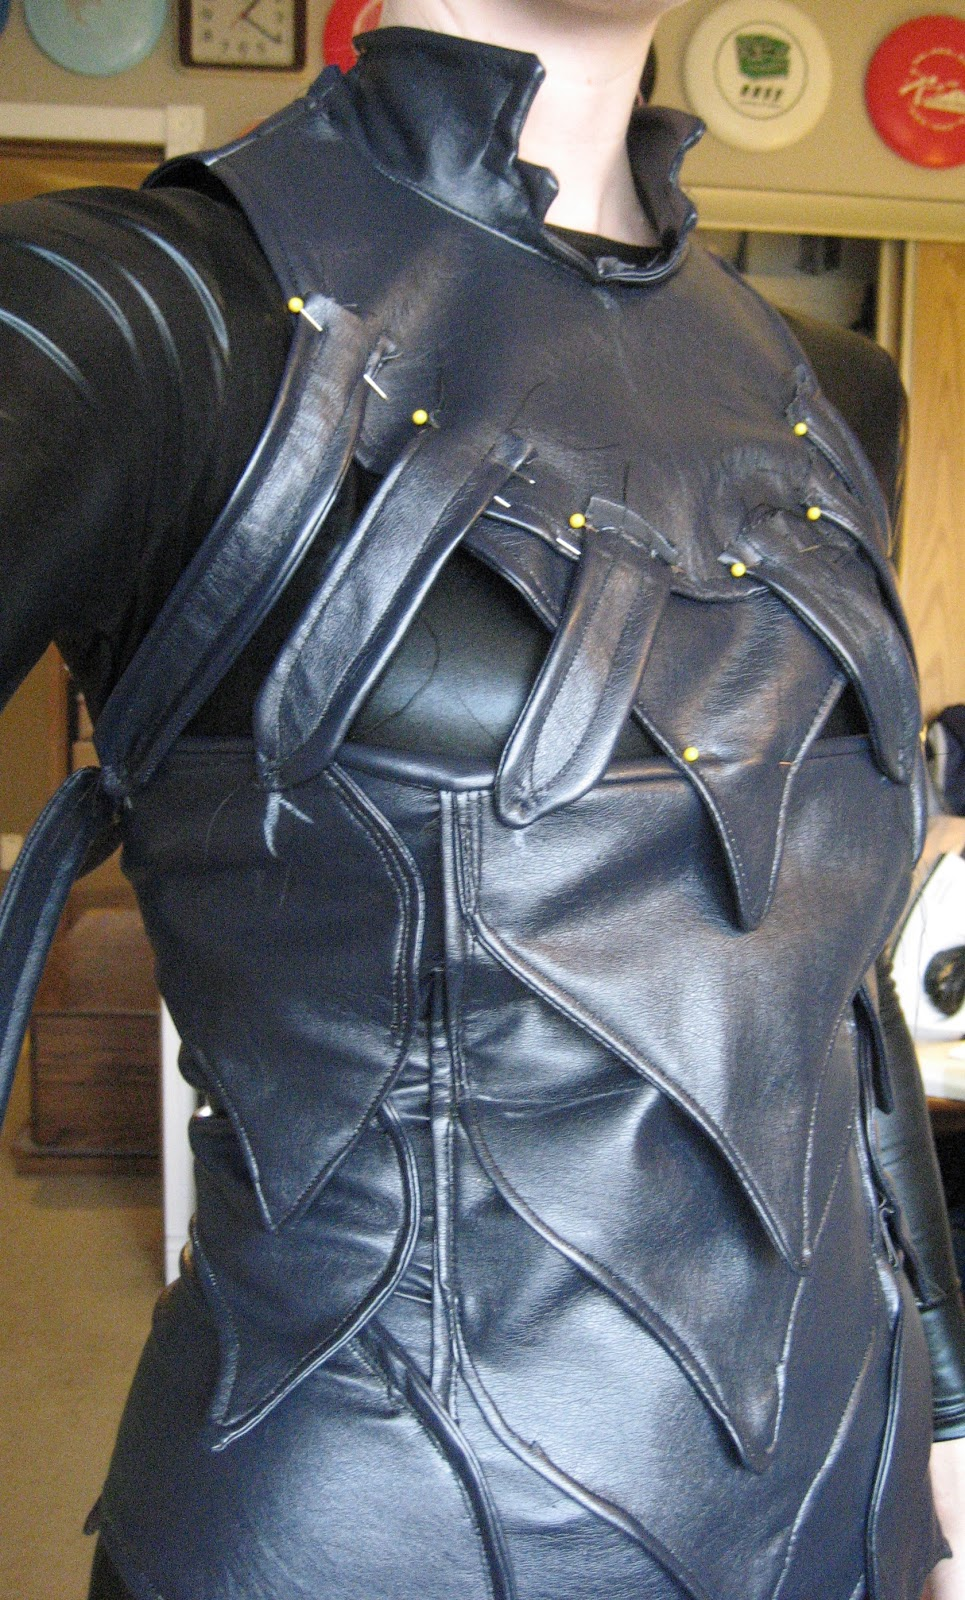 Beebichu S Costume Creations How To Make Skyrim Armor